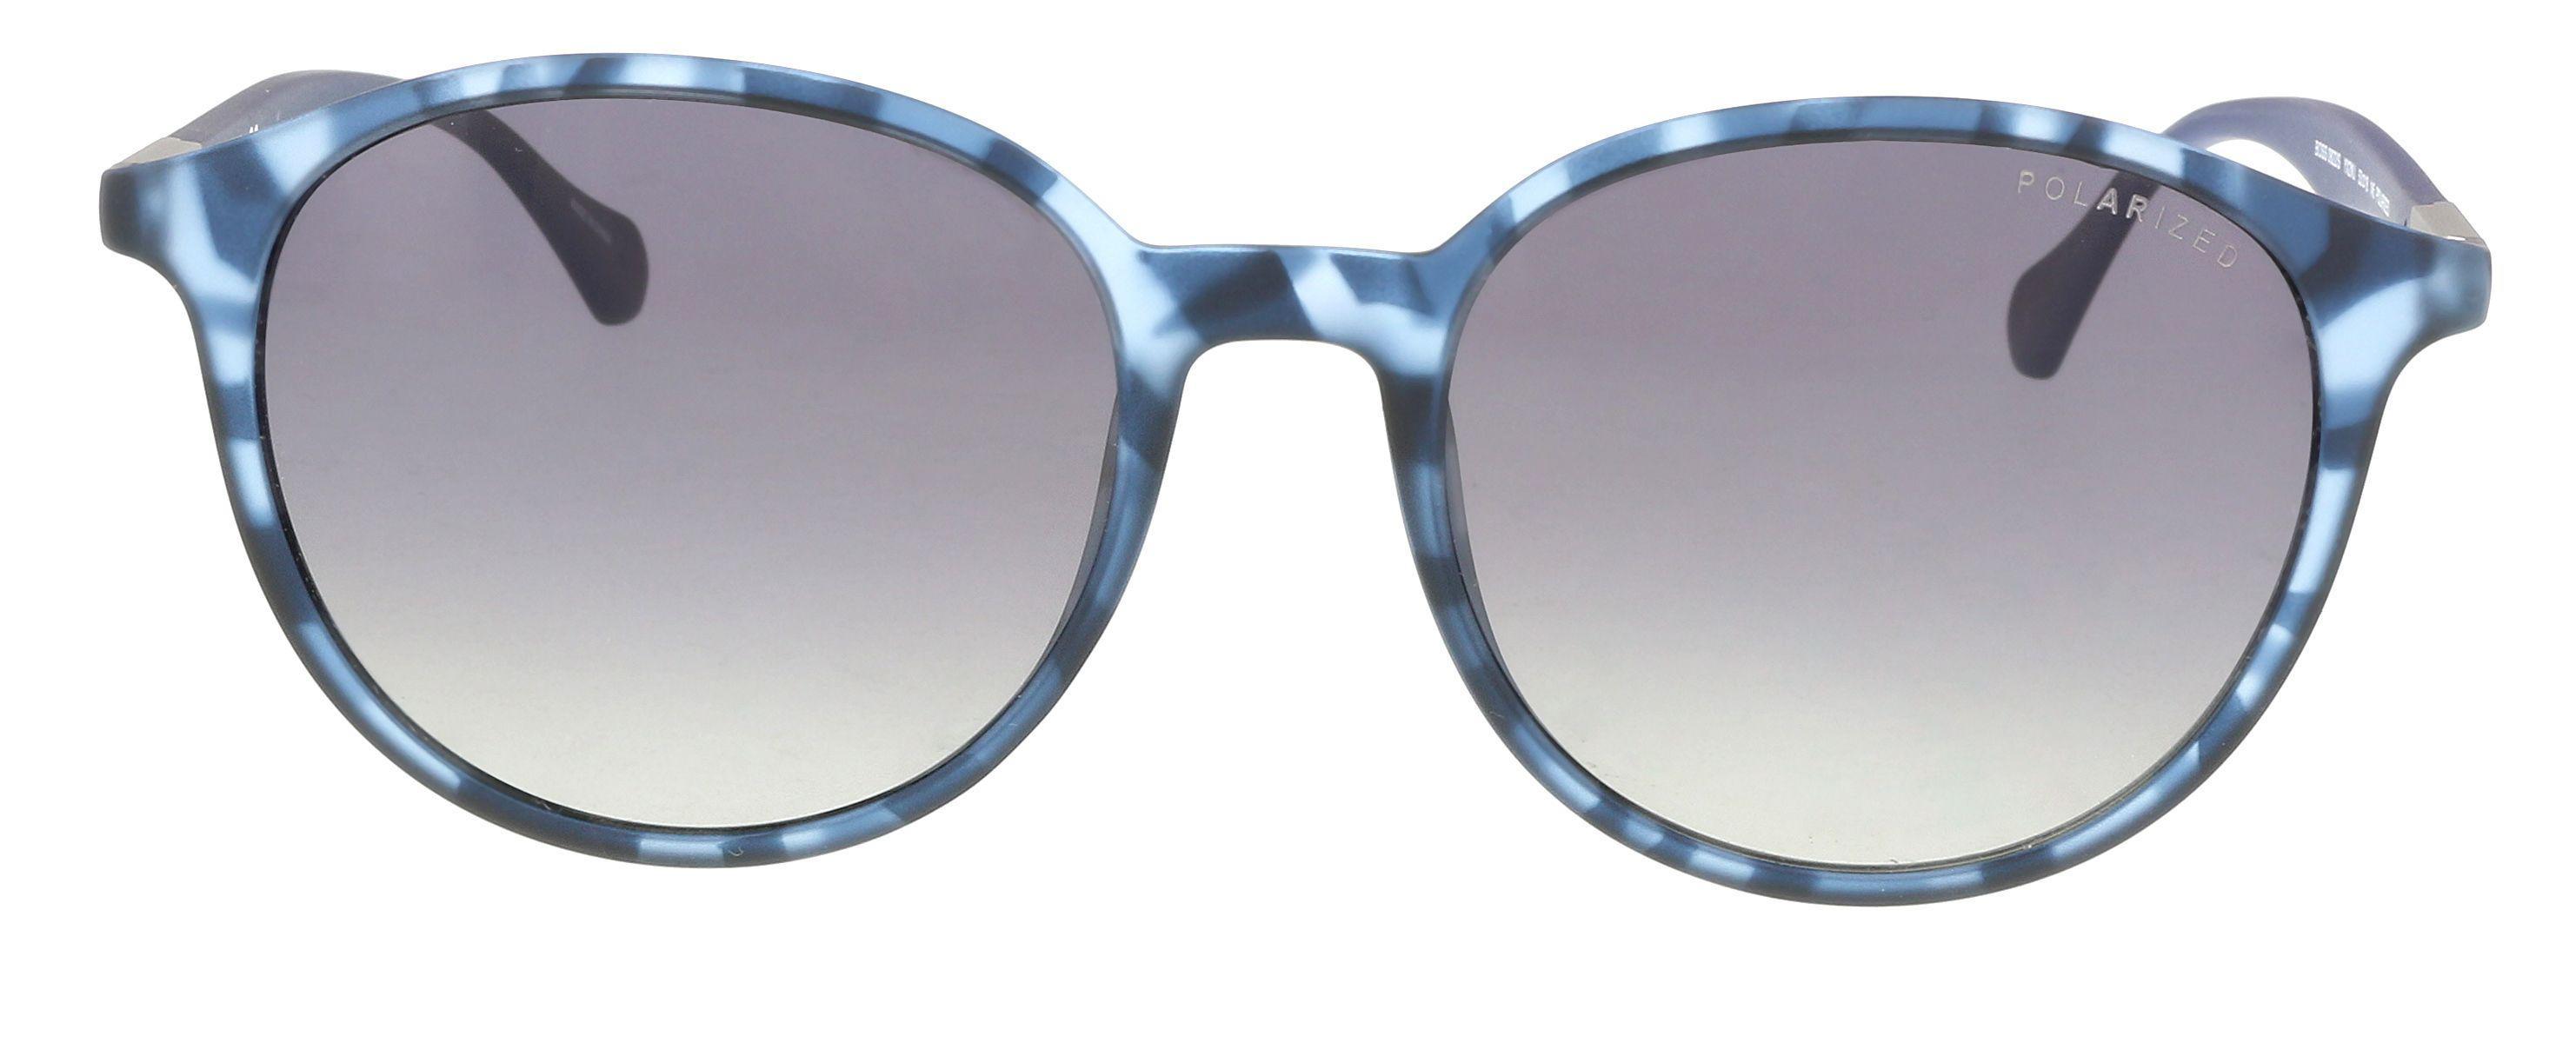 c30b42615b Lyst - Boss 0822 s 0yx2- Wj Grey Blue Oval Sunglasses in Blue for Men